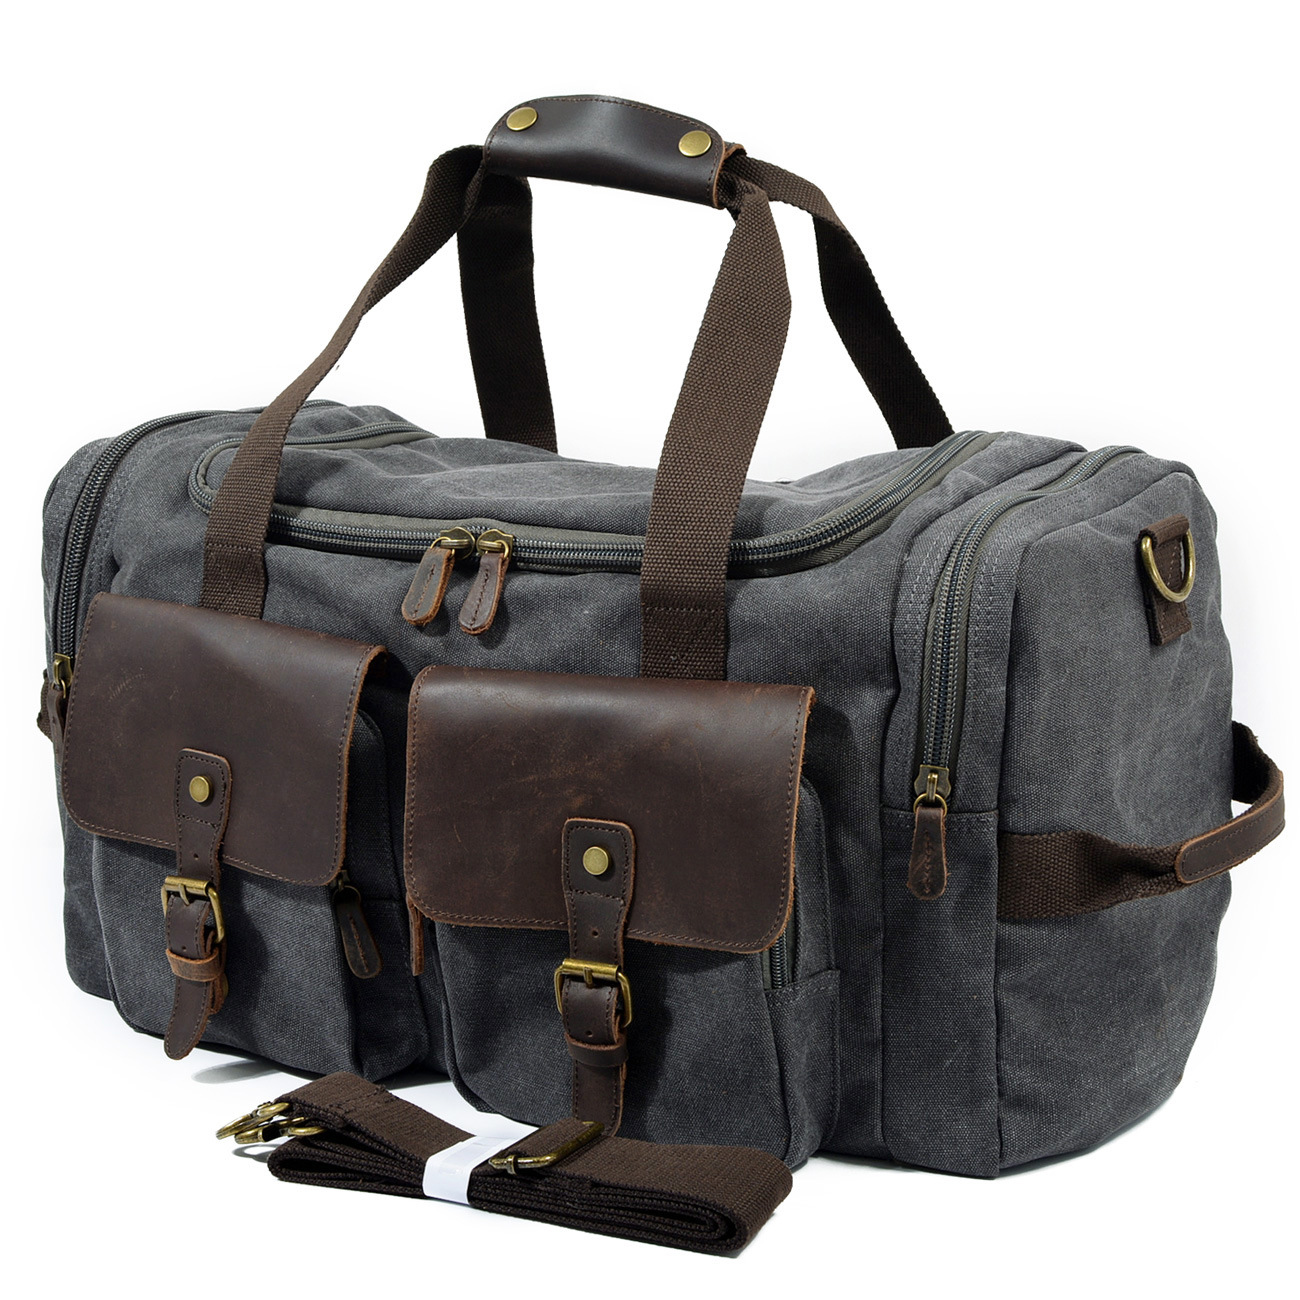 цены на Men Waterproof Duffel Bag Canvas Carry On Weekend Bags Vintage Military Shoulder Handbag Leather Travel Tote Large Overnight Bag в интернет-магазинах